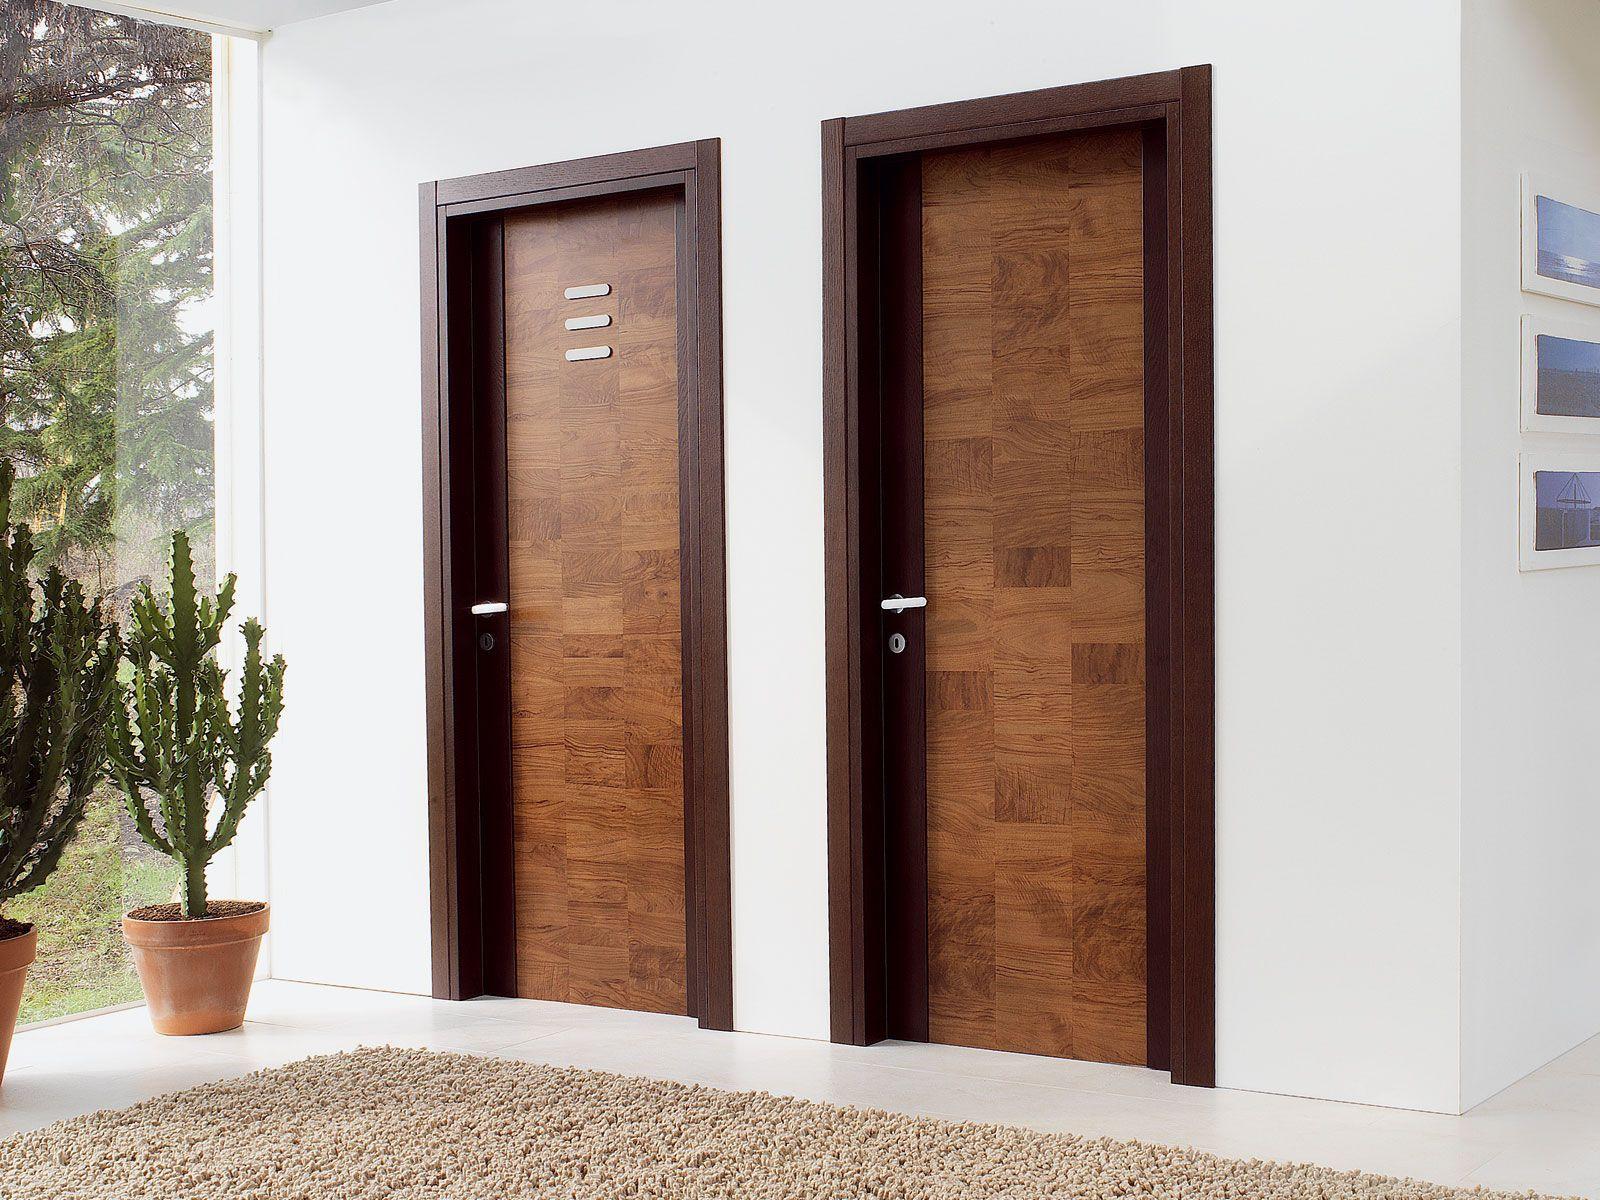 Porte poussante en bois planet by ghizzi benatti for Porte bois design